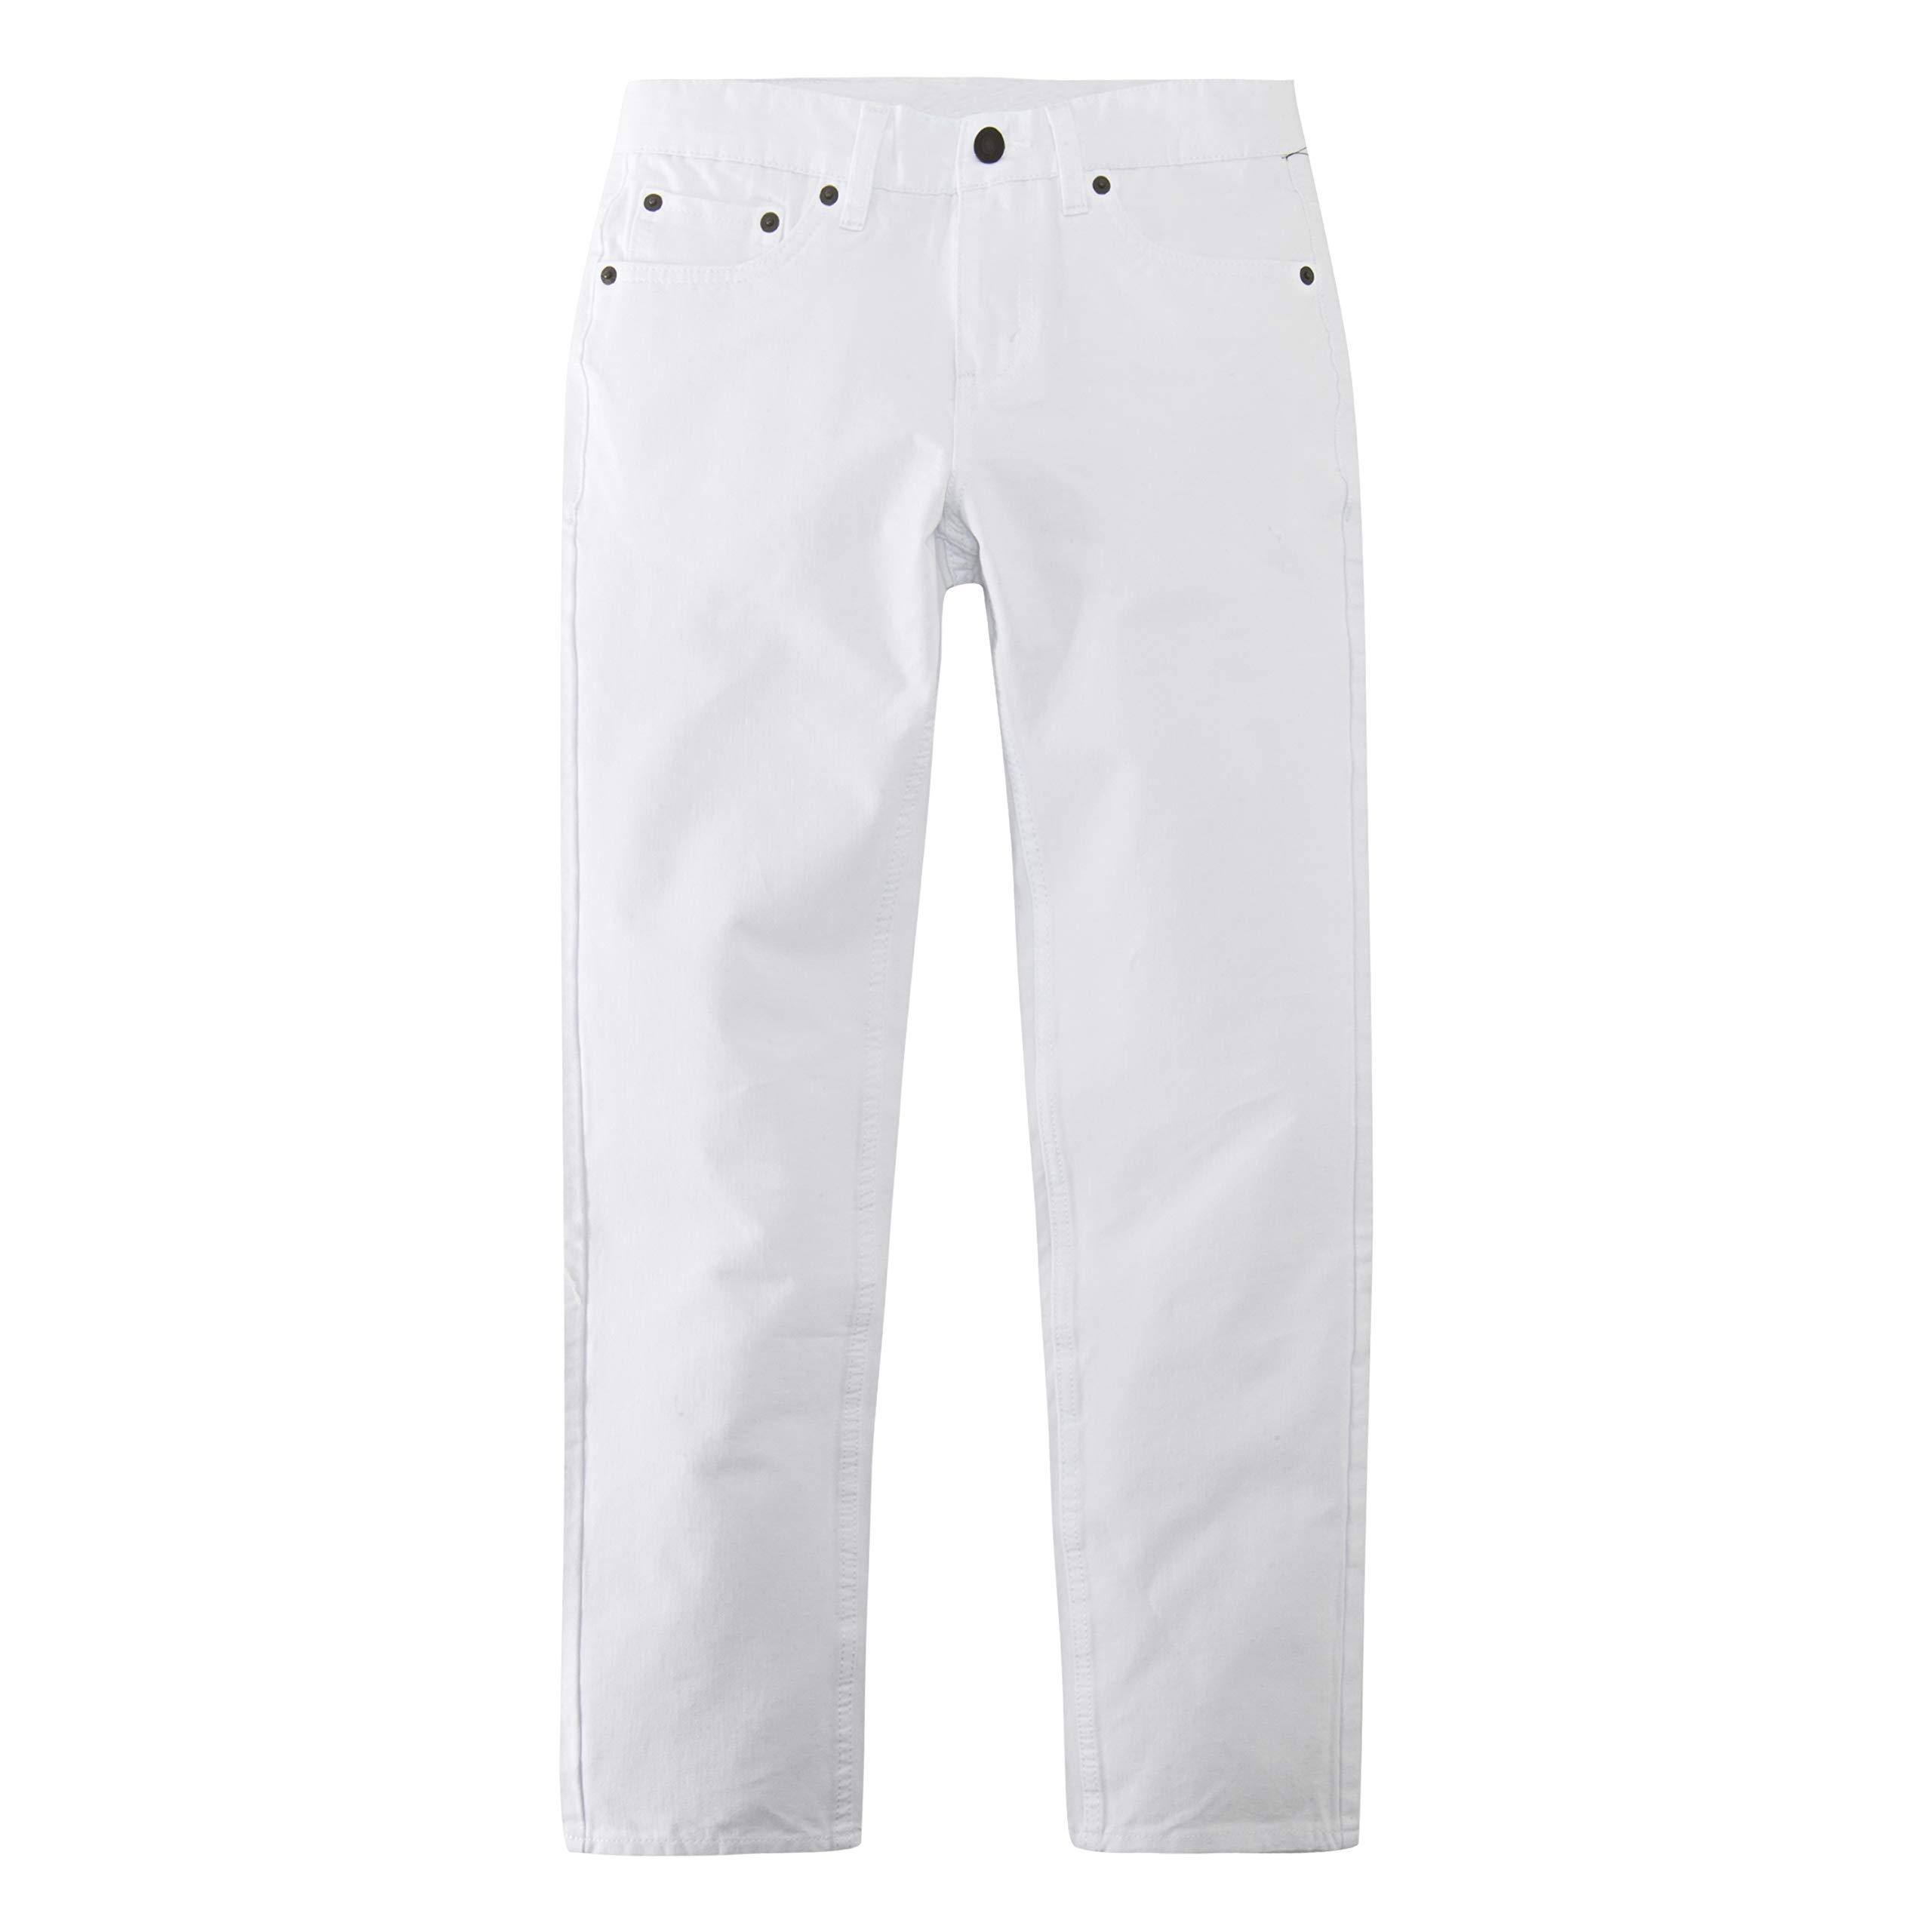 Levi's Boys' Big 502 Regular Fit Taper Jeans, White, 10